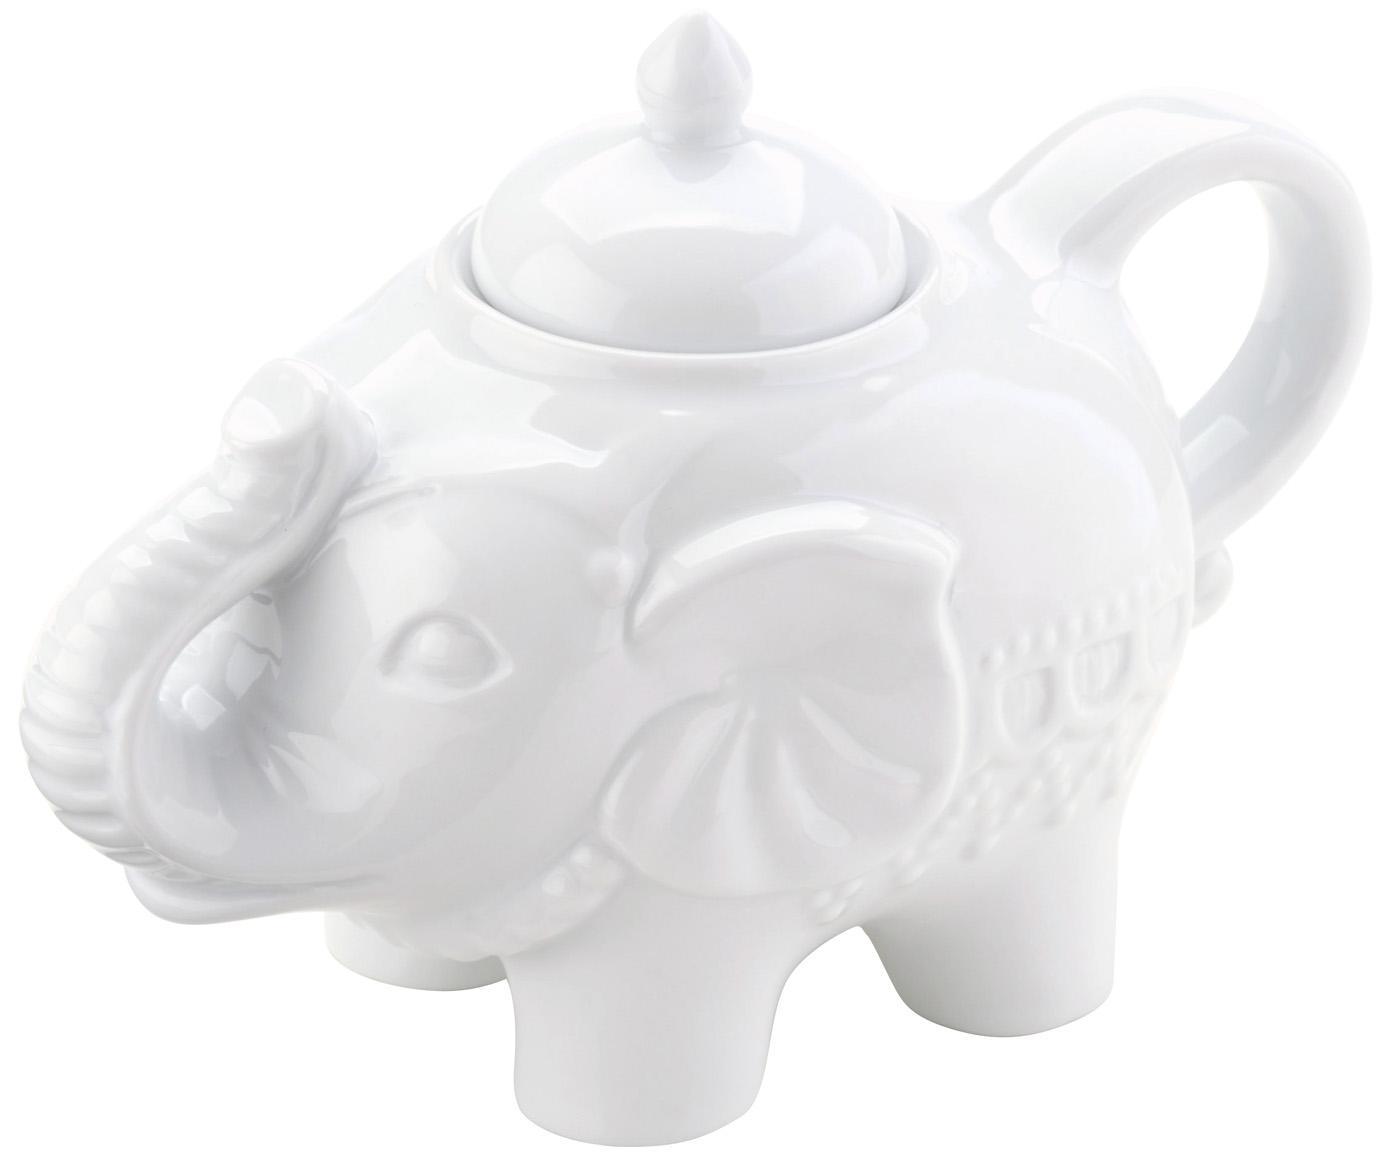 Zuccheriera Elephant, Porcellana, Bianco, L 15 x A 12 cm